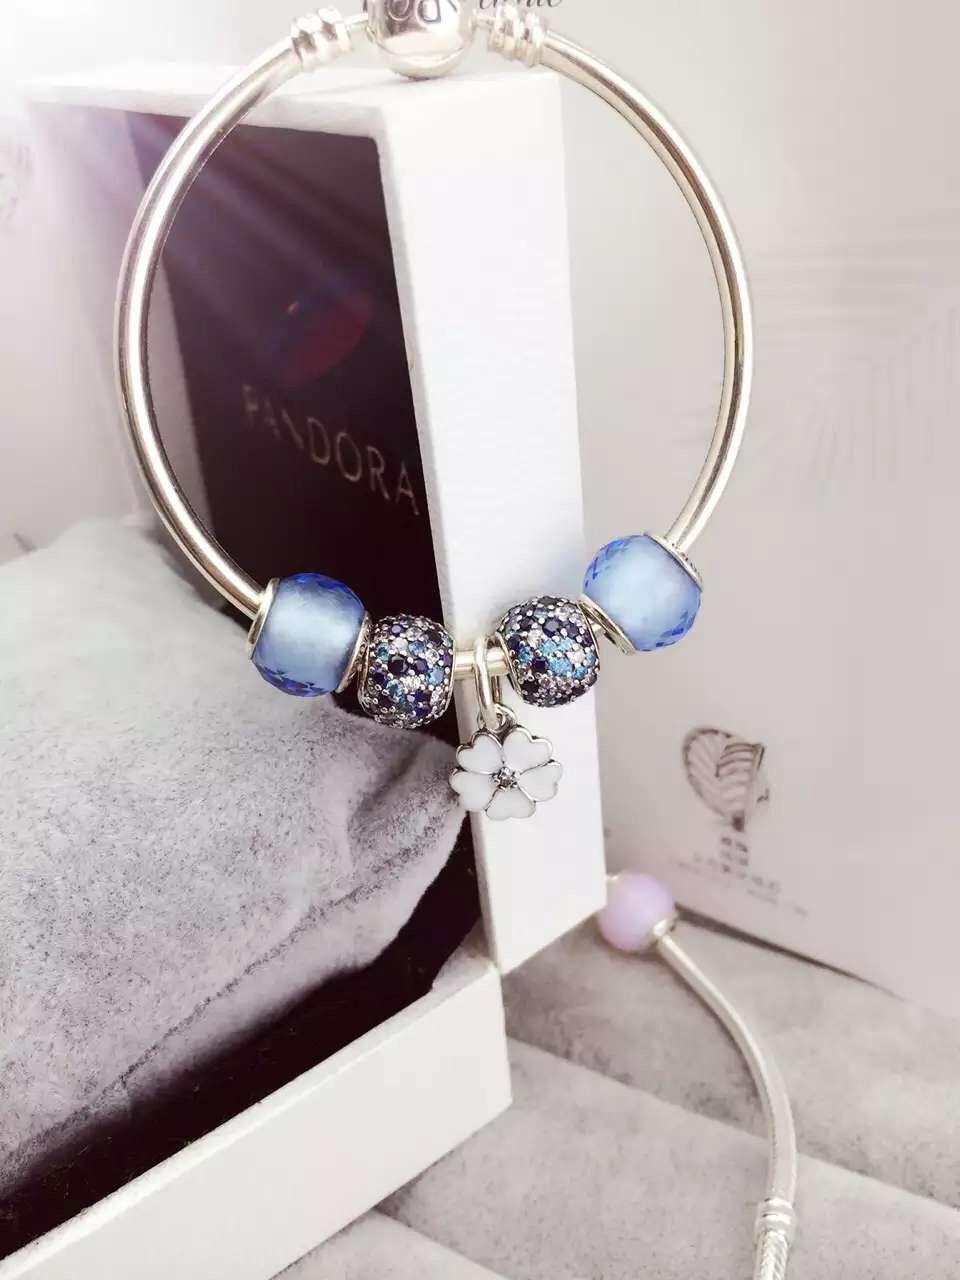 50 off 159 pandora bangle charm bracelet blue flower hot sale 159 pandora bangle charm bracelet blue flower hot sale izmirmasajfo